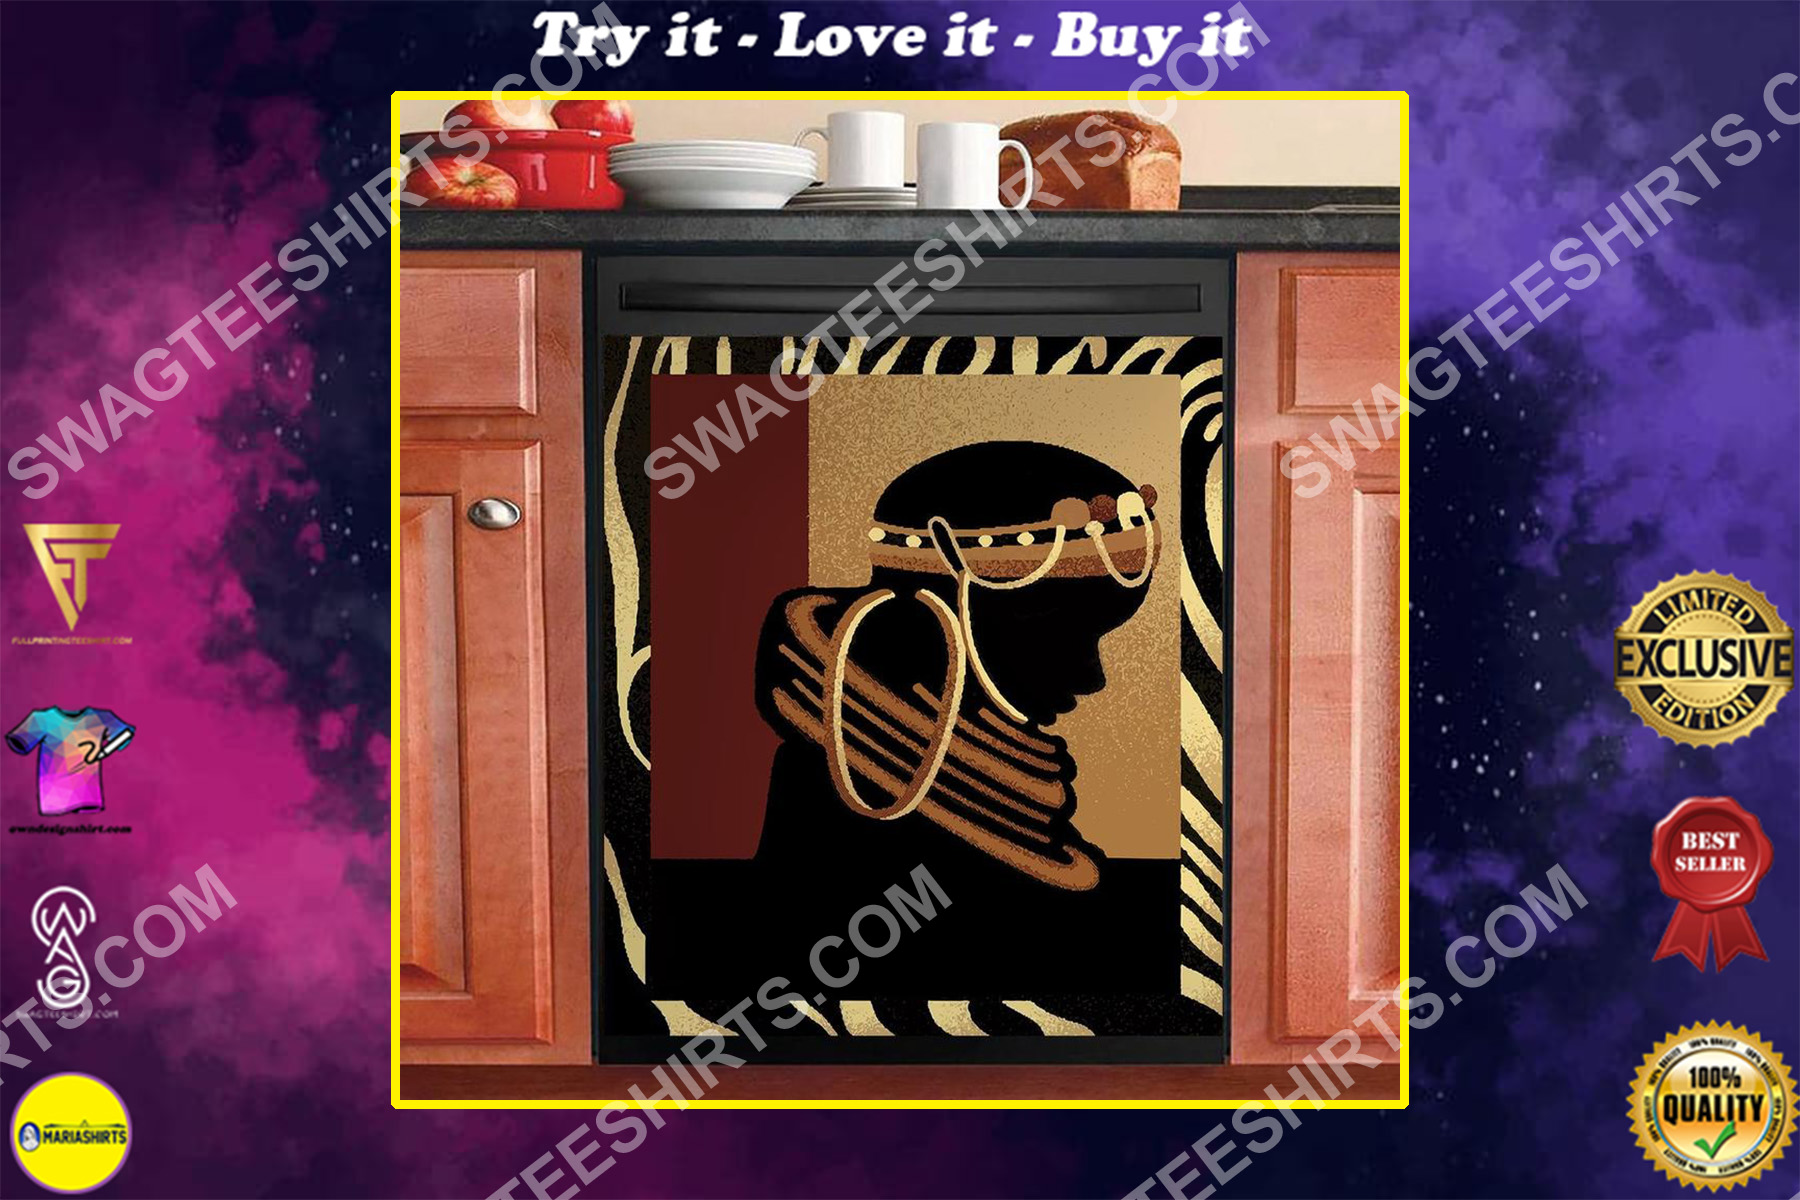 african women kitchen decorative dishwasher magnet cover